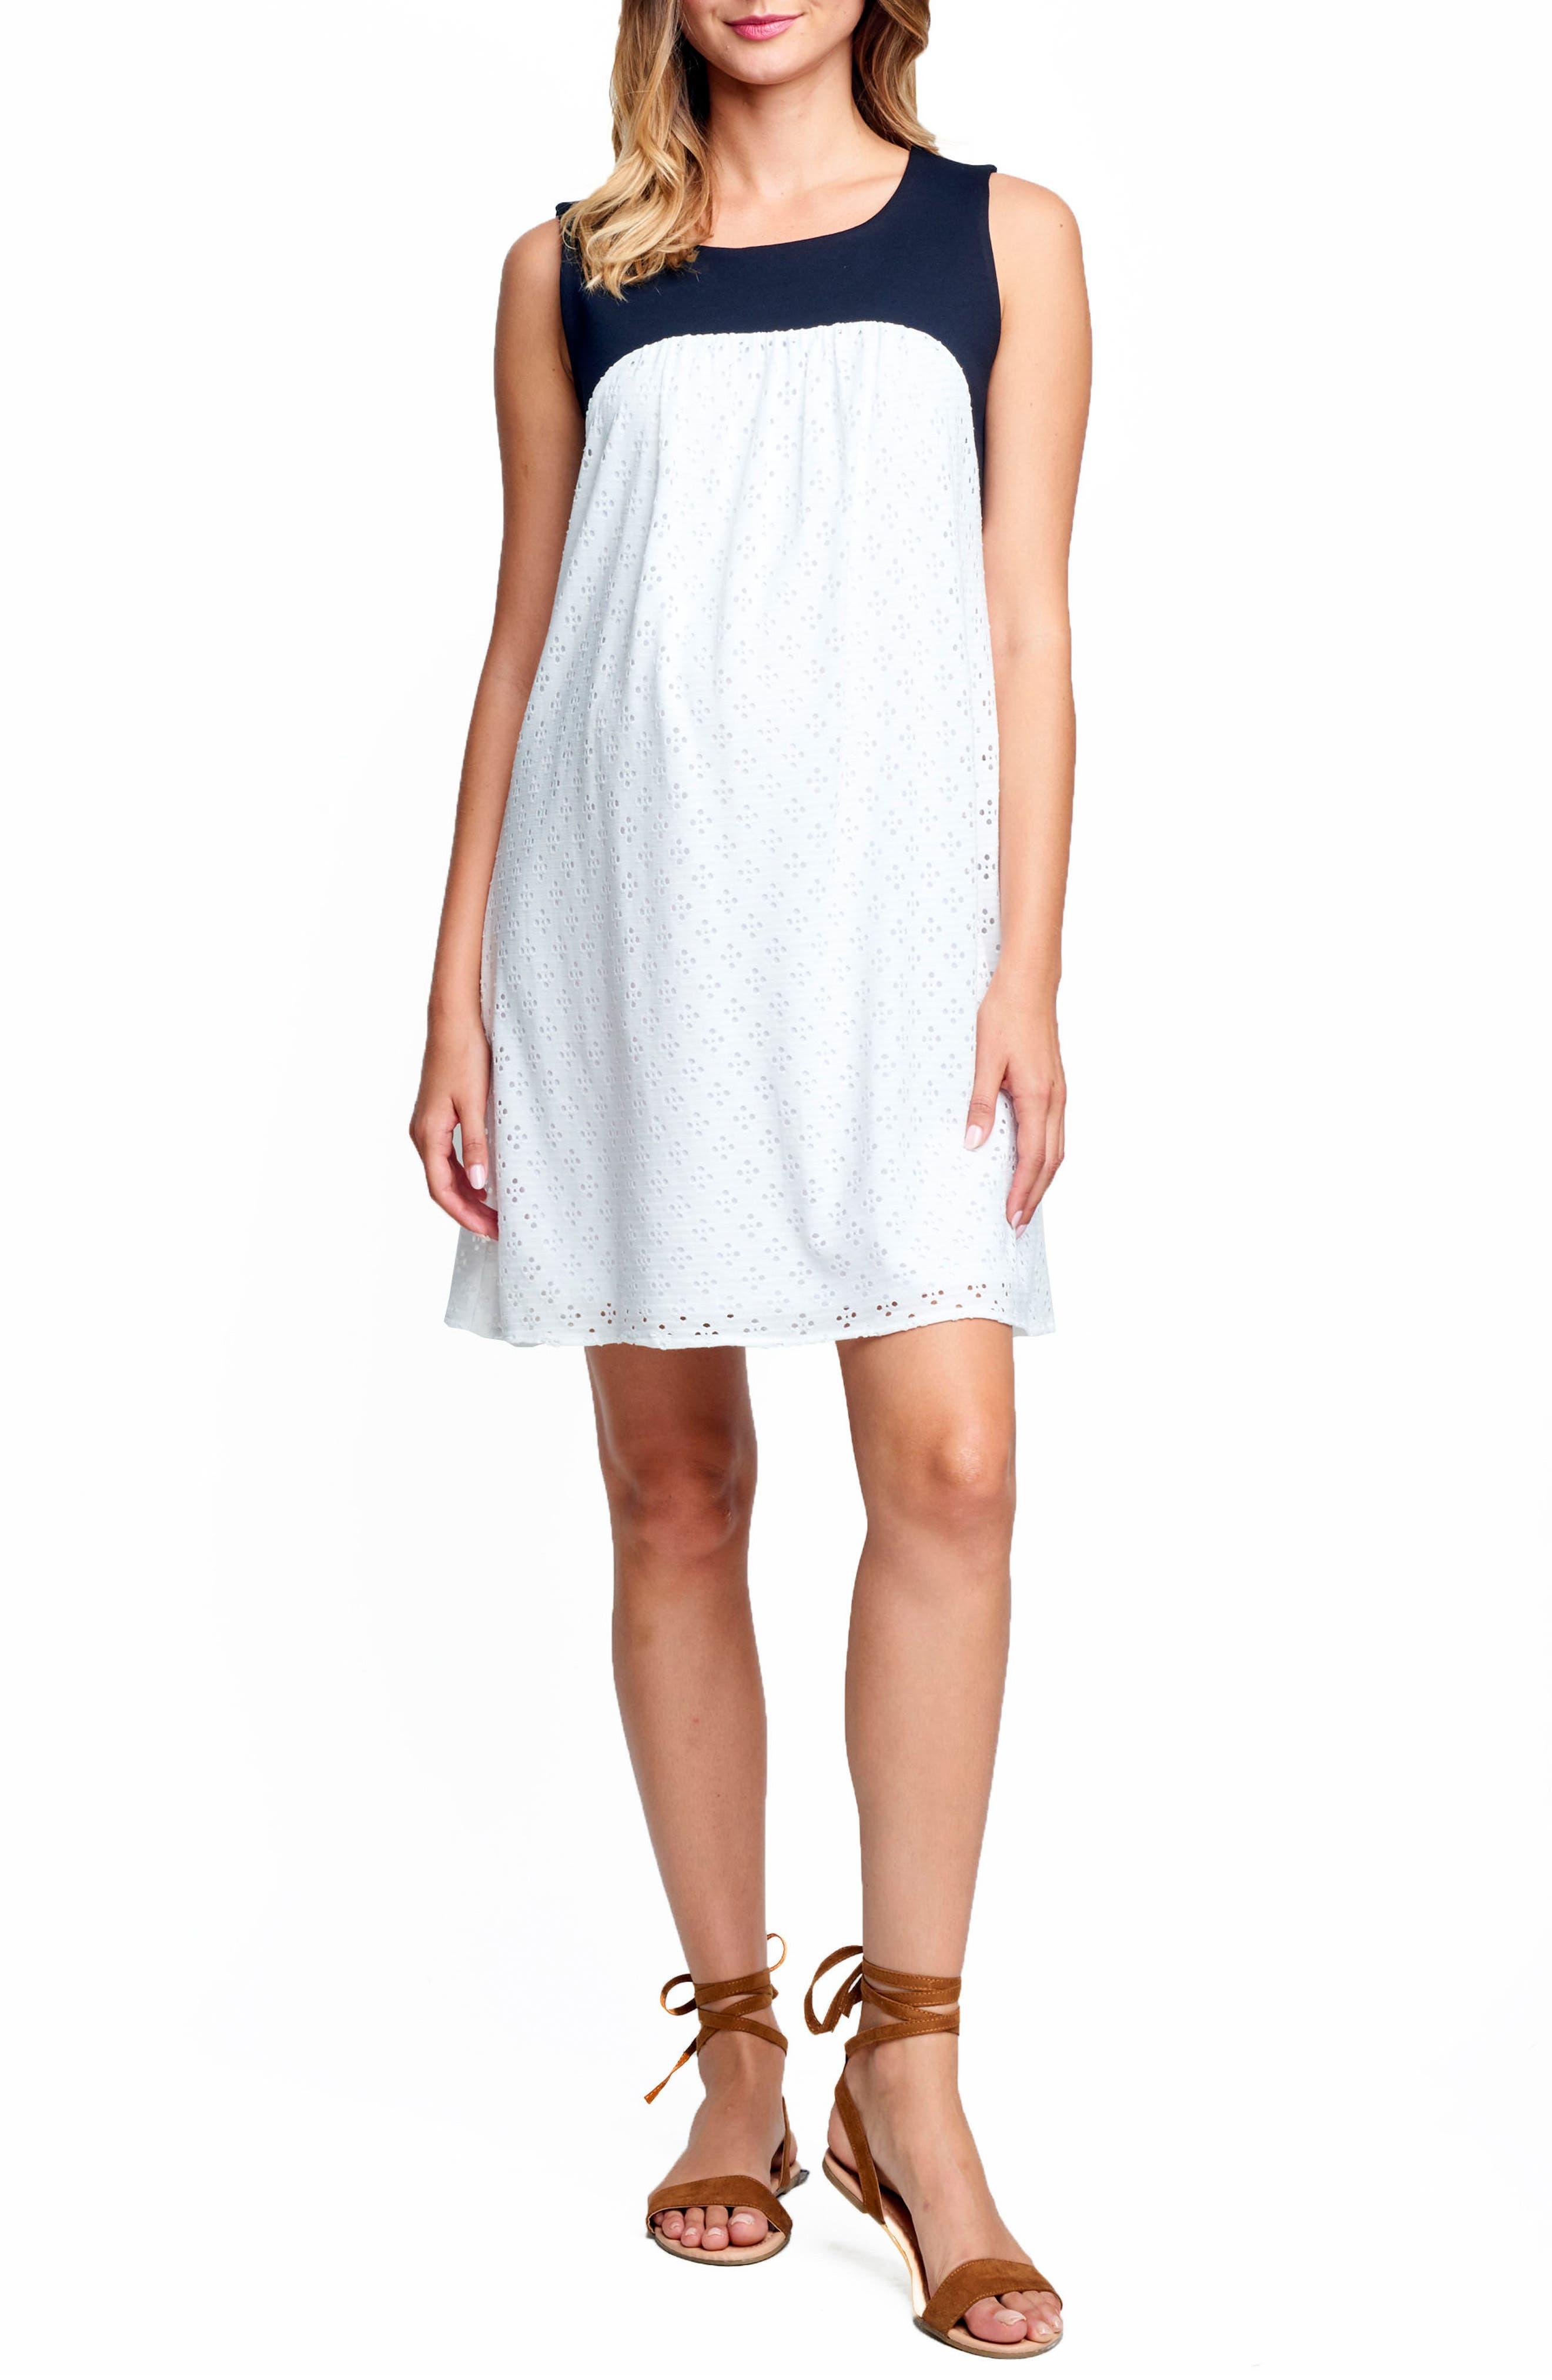 Babydoll Maternity Dress,                         Main,                         color, White Eyelet/ Black